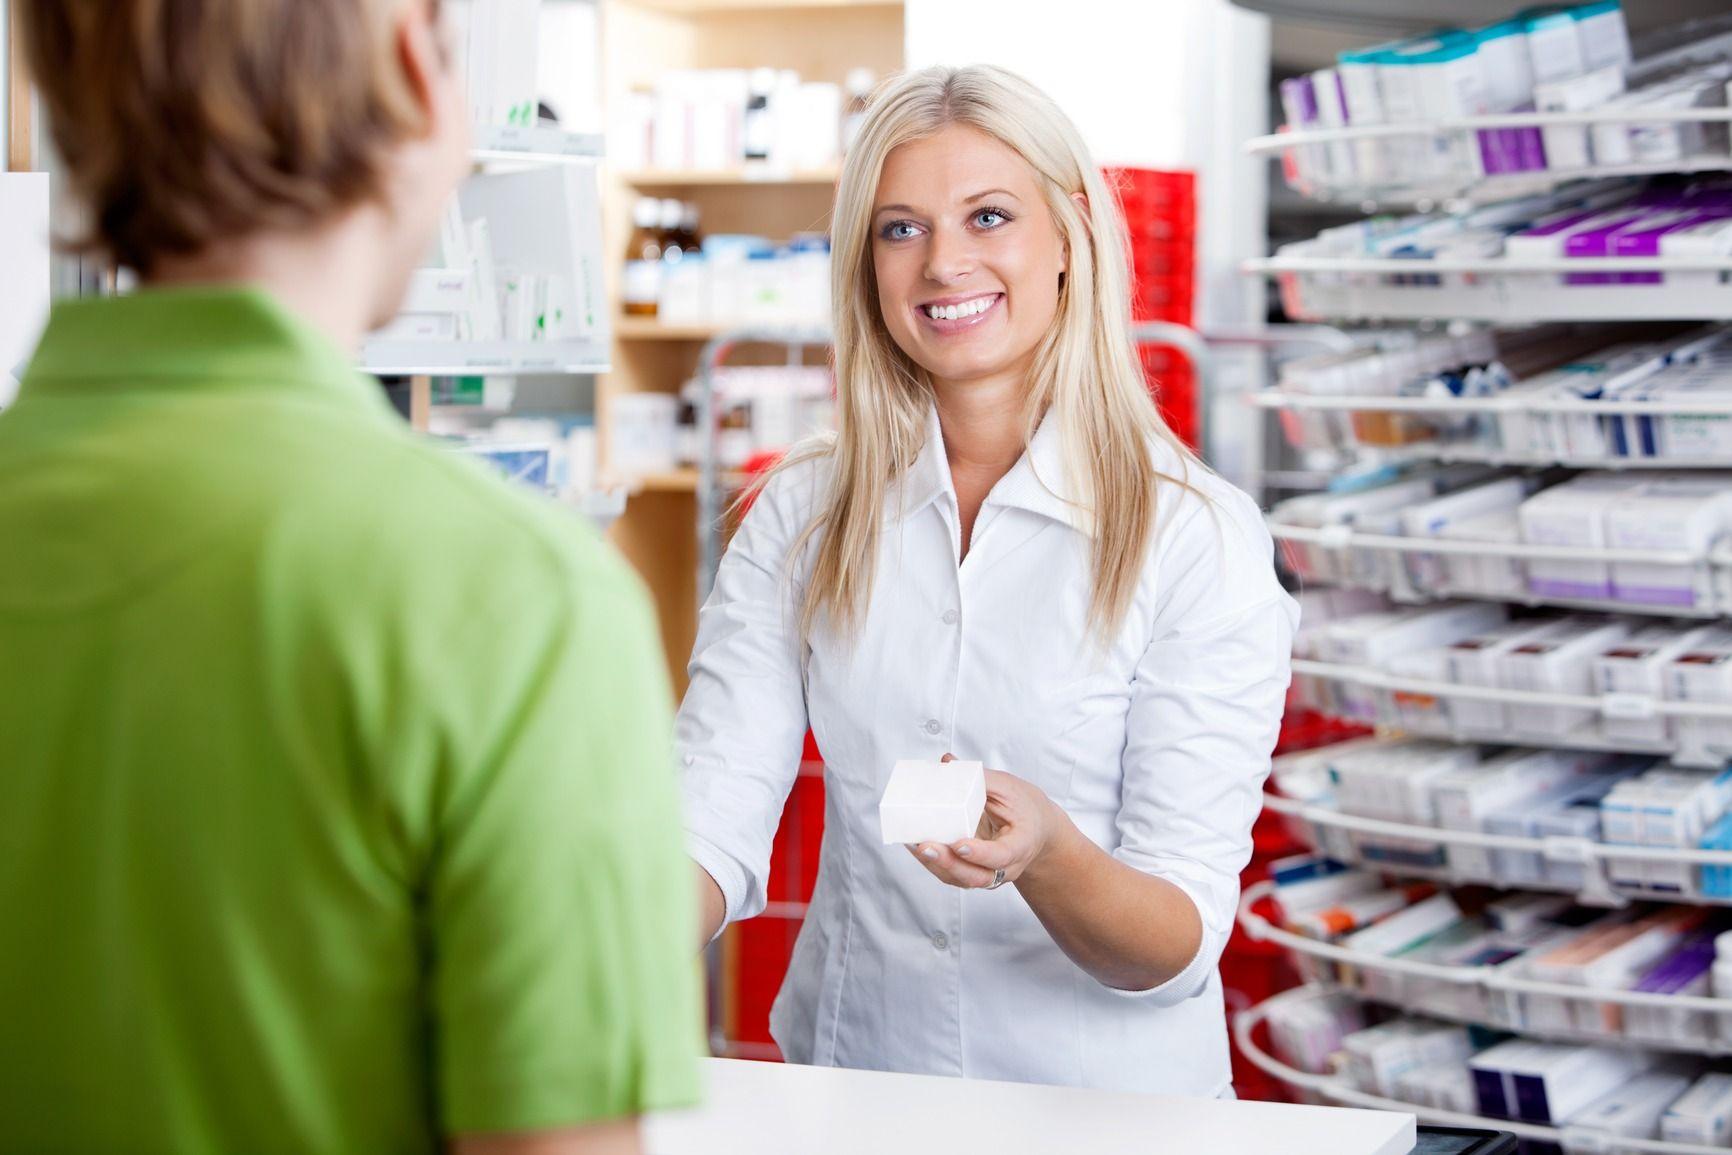 Pharmacy technician 5 Customer Service Phrases to